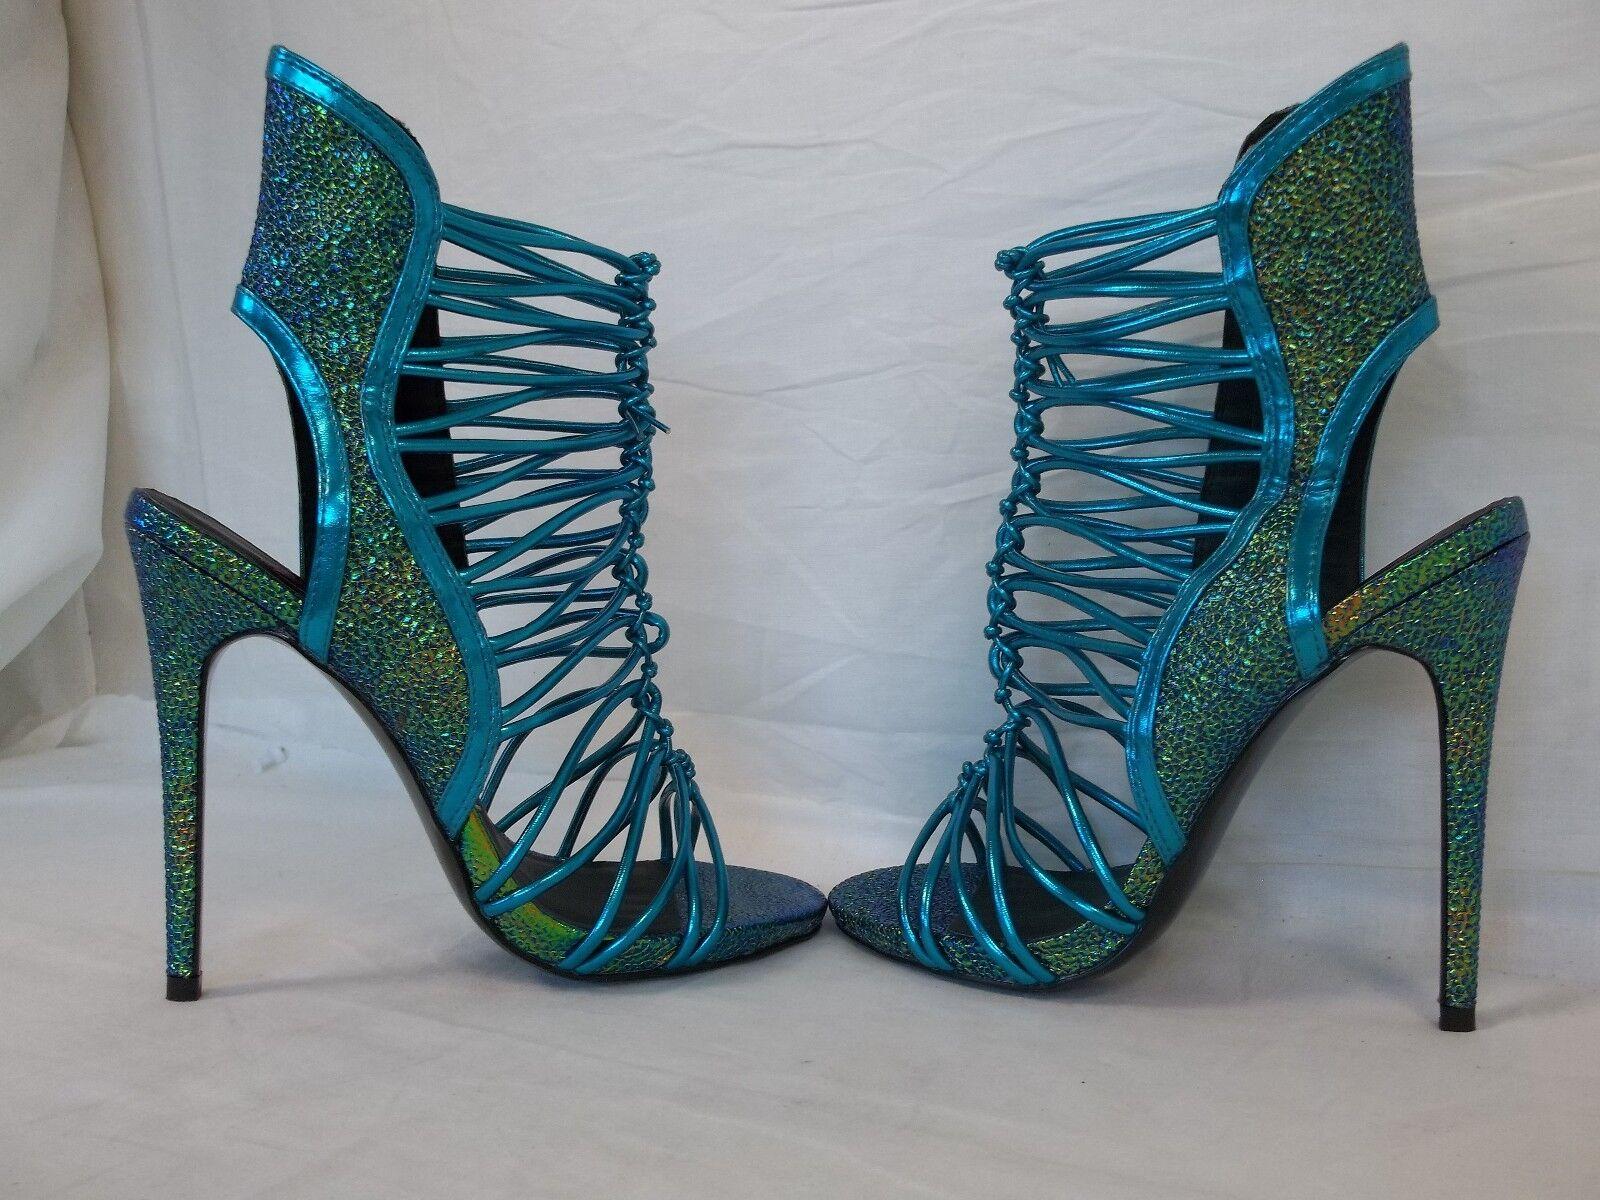 Keyshia Cole Steve Madden 8 8 8 M Movit Teal Open Toe Heels New Damenschuhe Schuhes NWOB c45e88